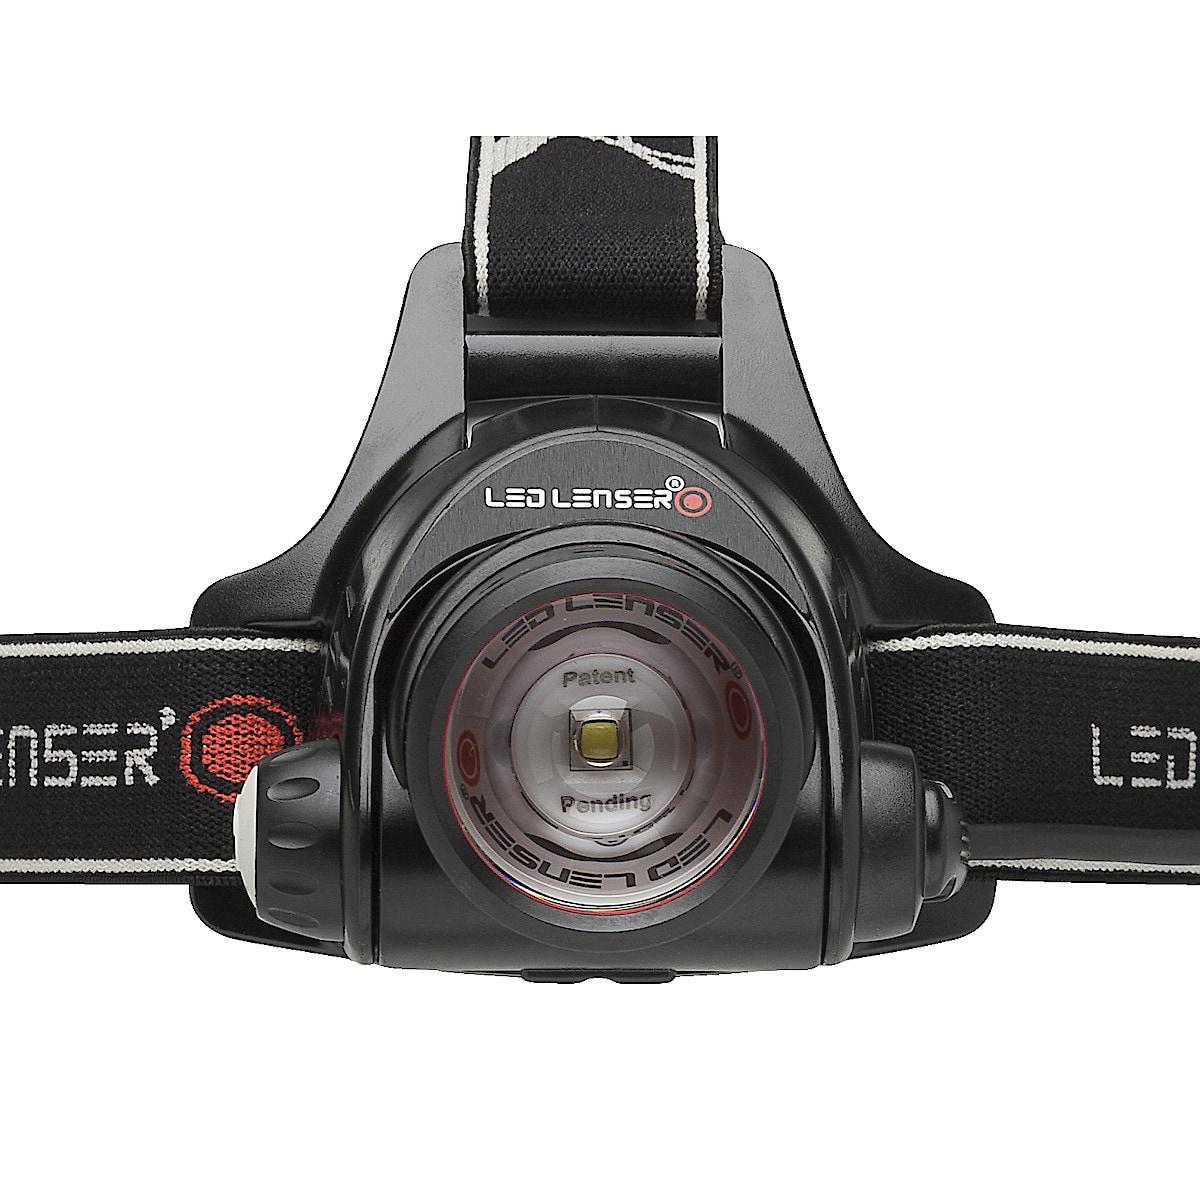 Pannlampa Ledlenser H14R.2